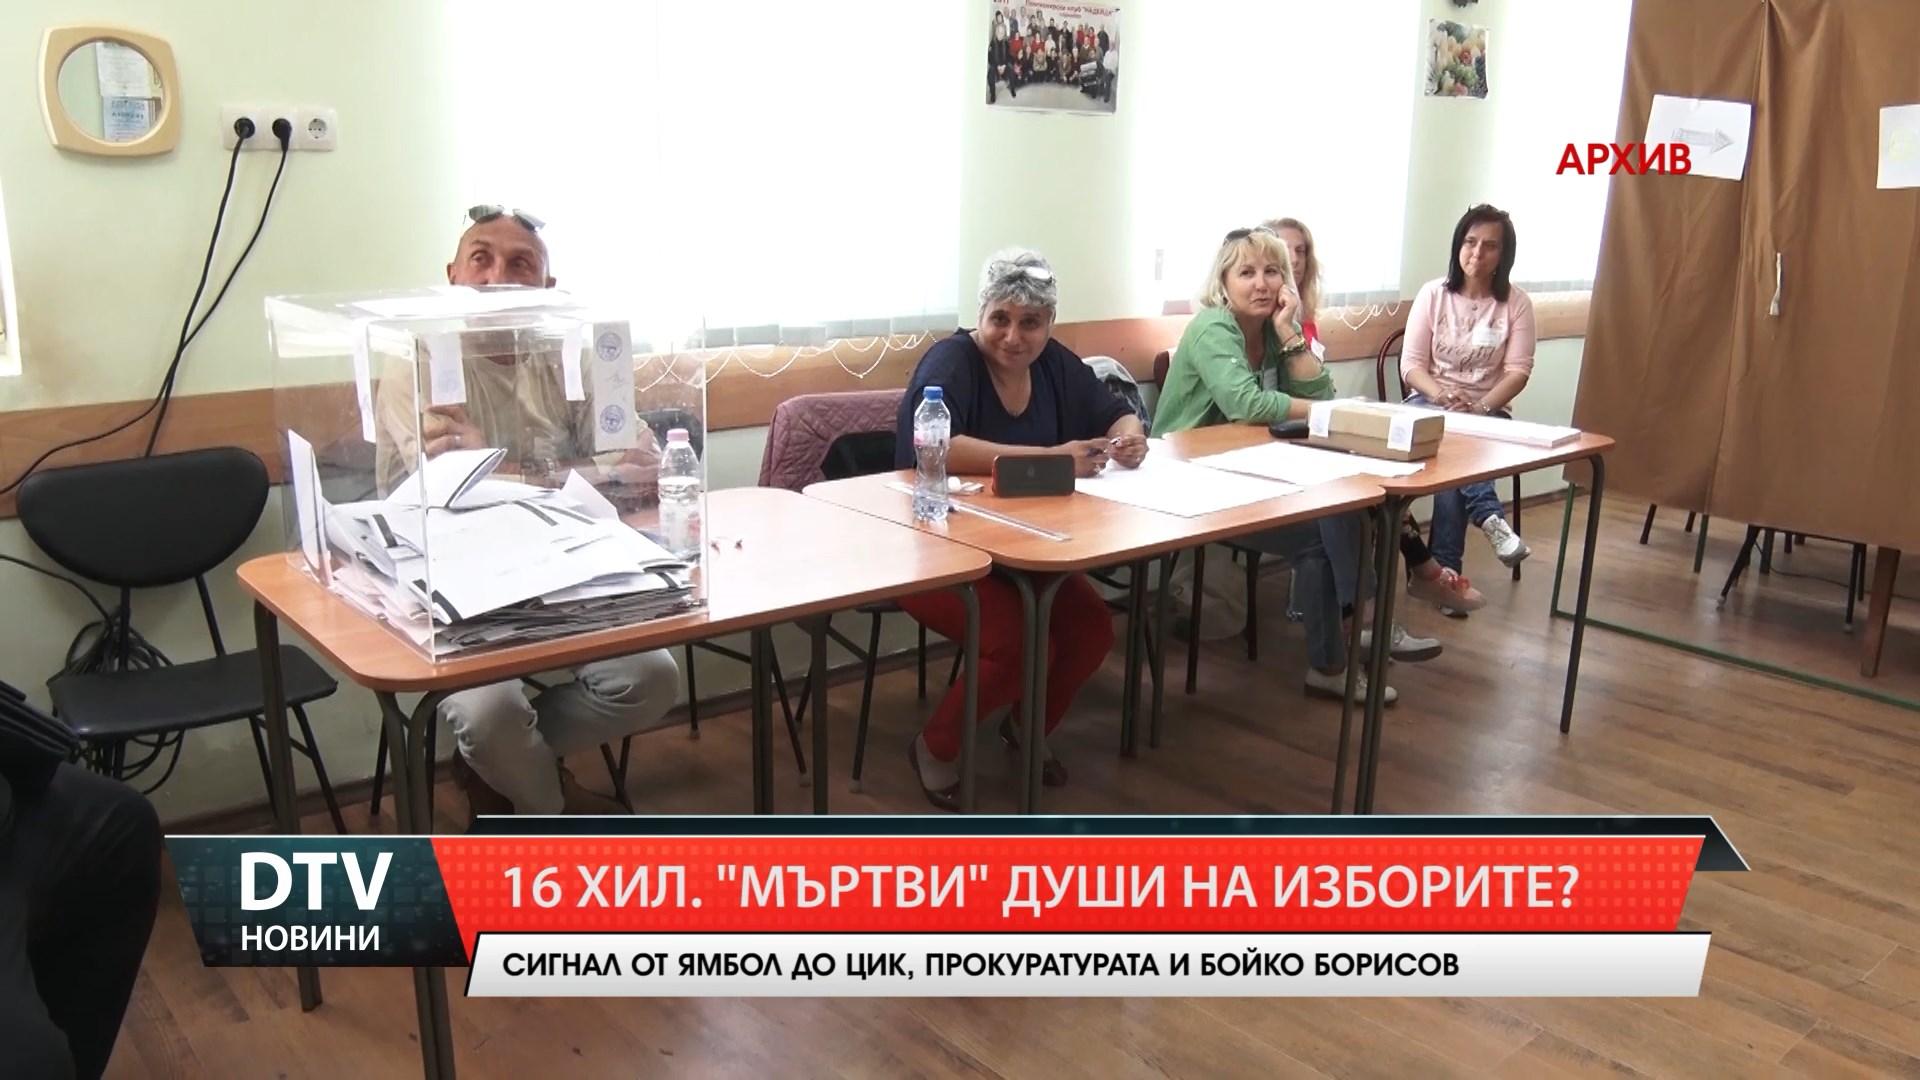 "16 хил. ""мъртви"" души за изборите? Сигнал от Ямбол до ЦИК, Прокуратурата и Бойко Борисов"